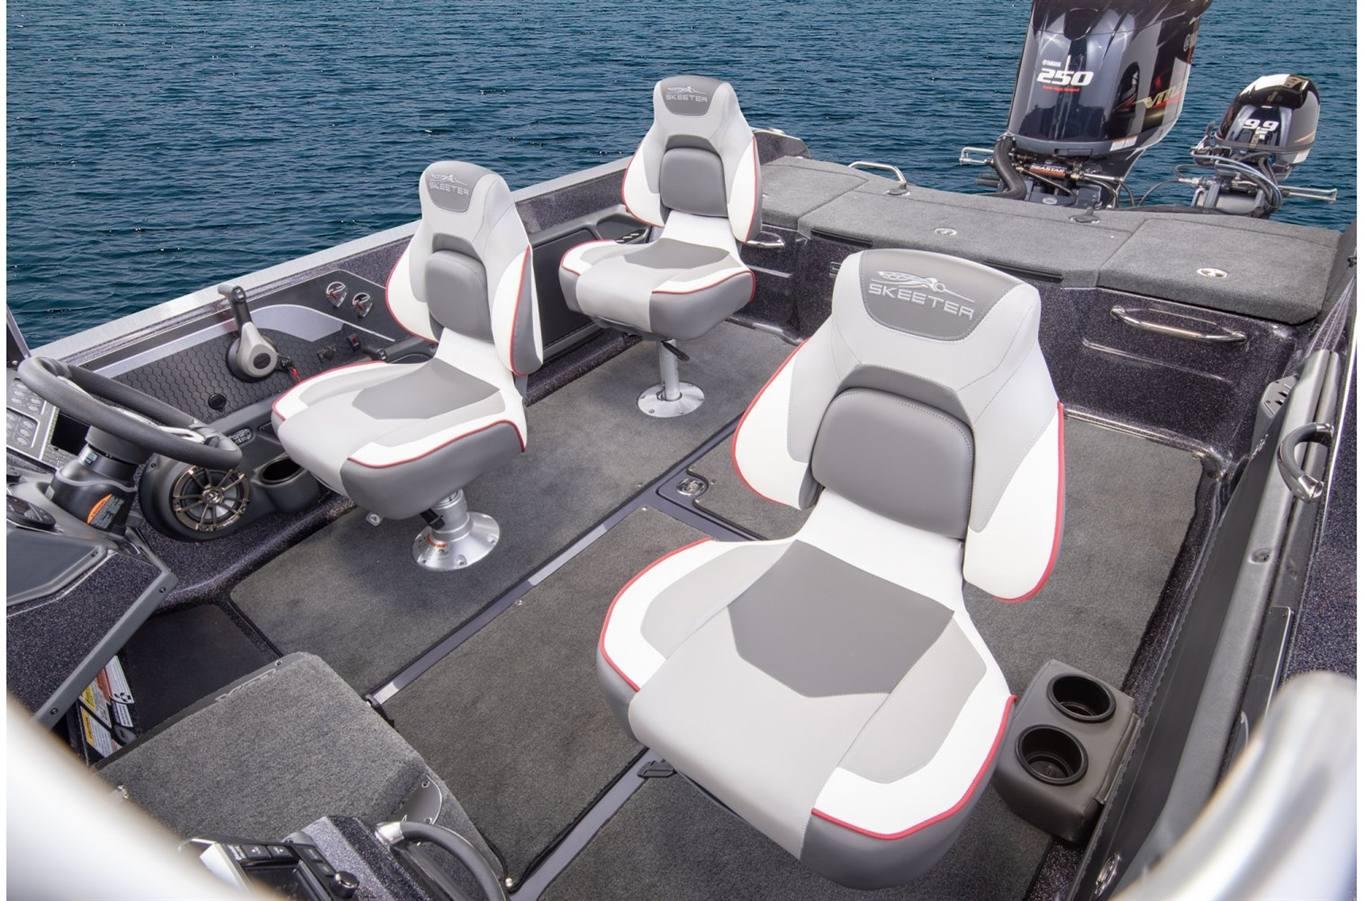 2019 Skeeter Wx2060 For Sale In Rogers Ar Bella Vista Marine Ac Dock Wiring Panel Next